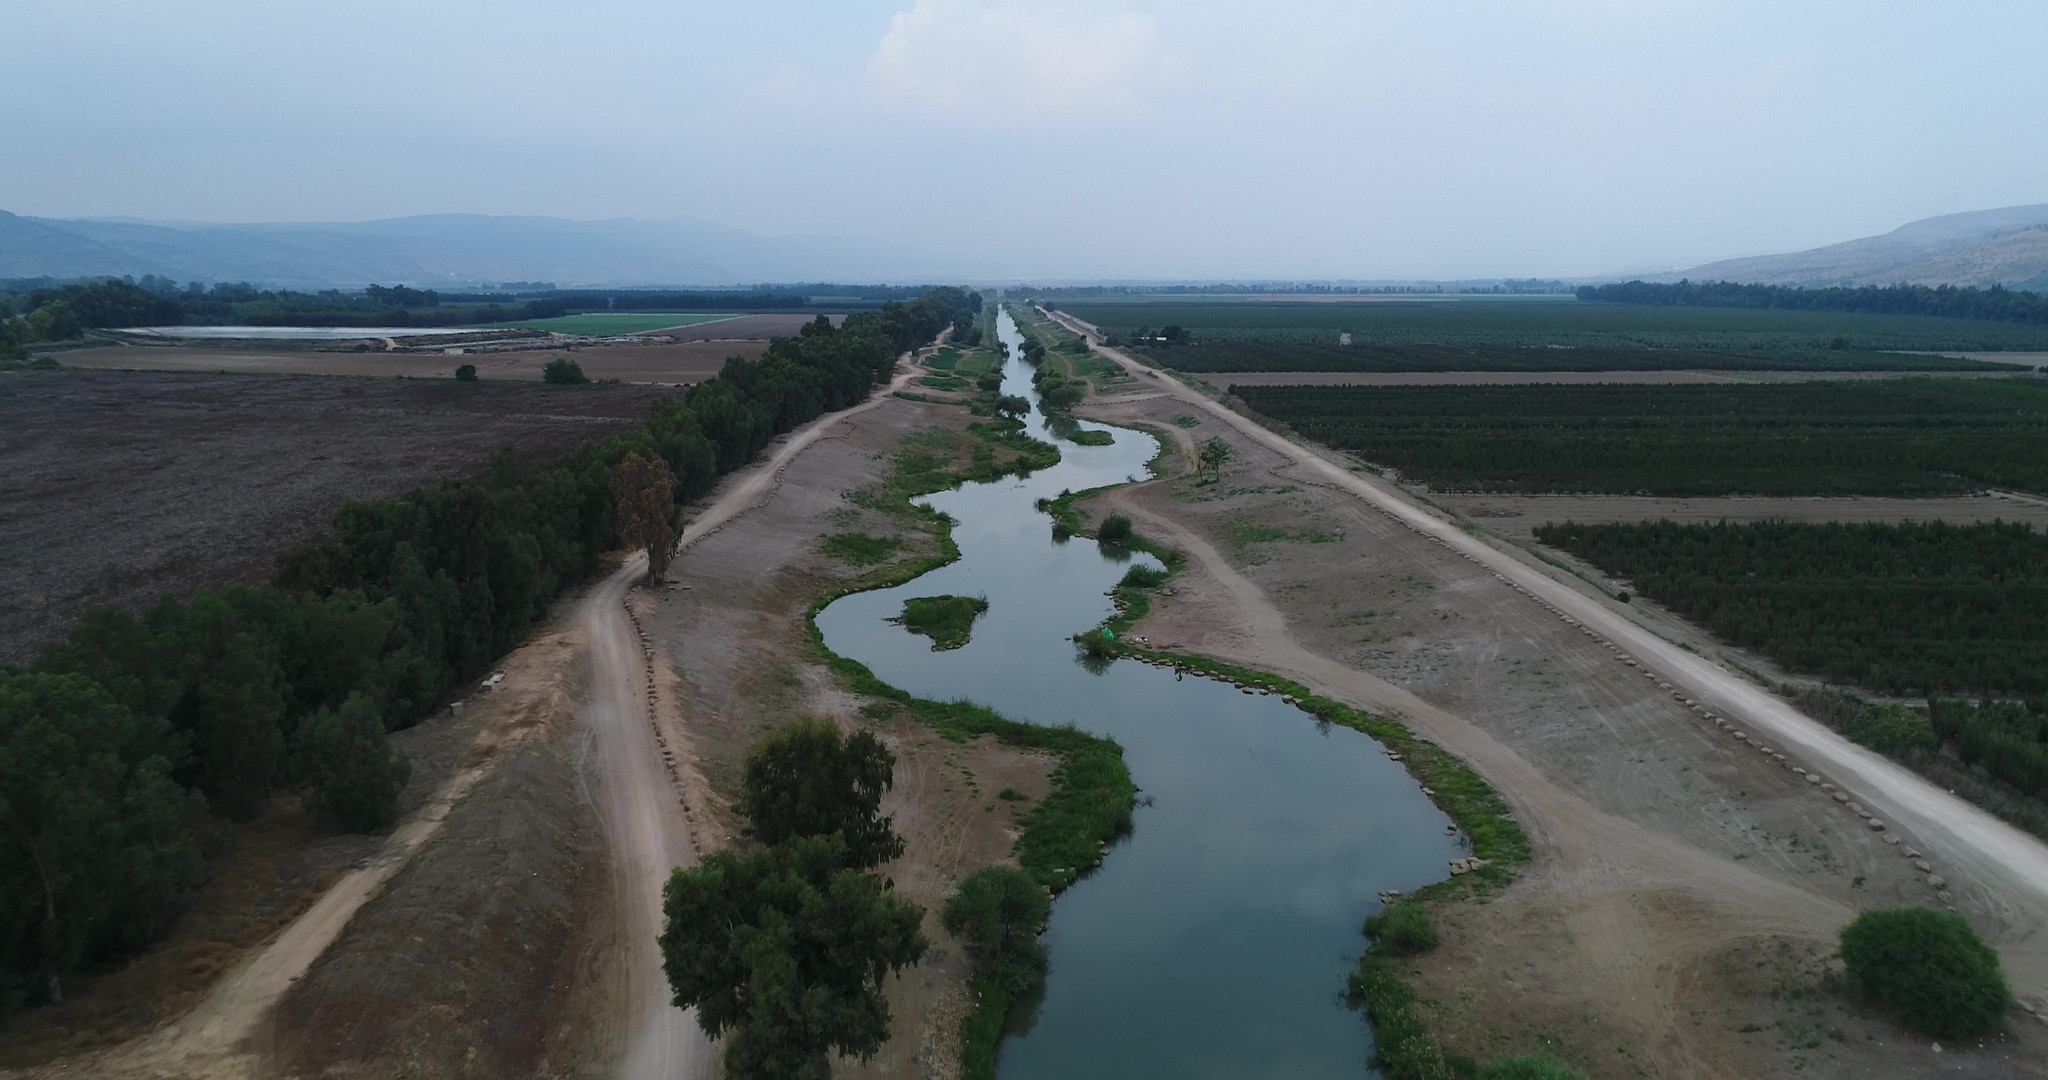 Jordan River by Viewing Area 3